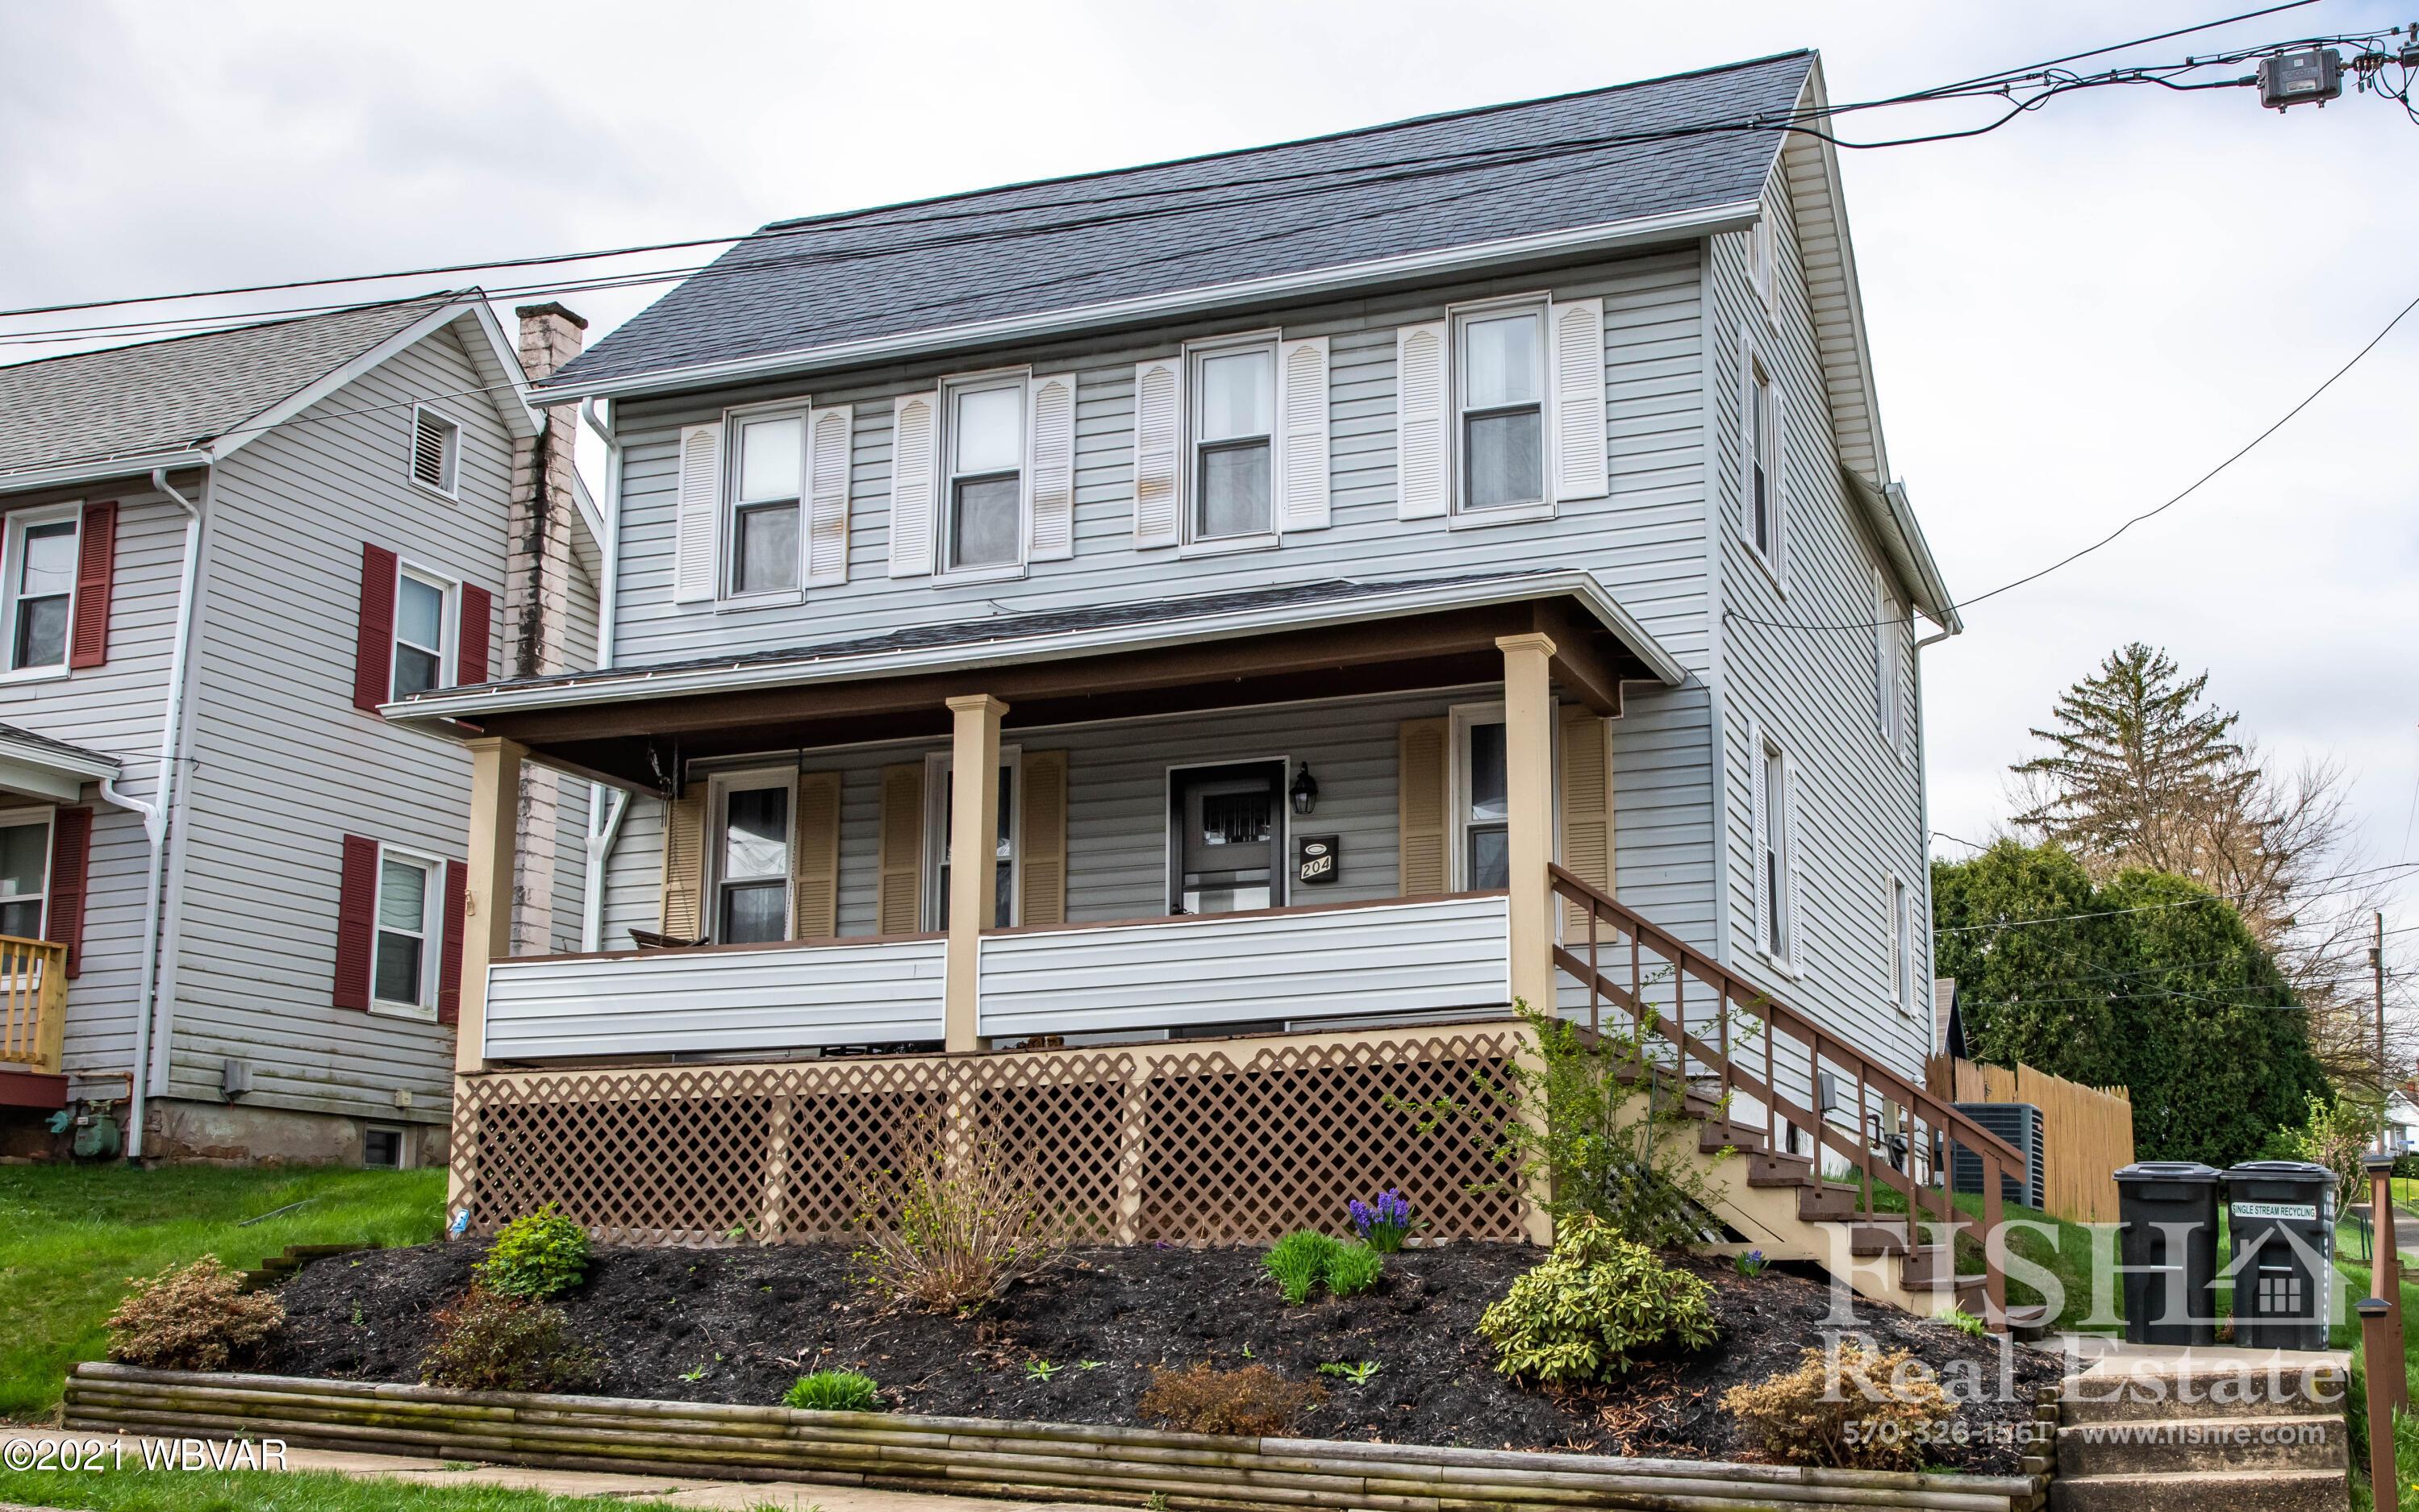 204 BEECH STREET, S. Williamsport, PA 17702, 4 Bedrooms Bedrooms, ,2 BathroomsBathrooms,Residential,For sale,BEECH,WB-92330